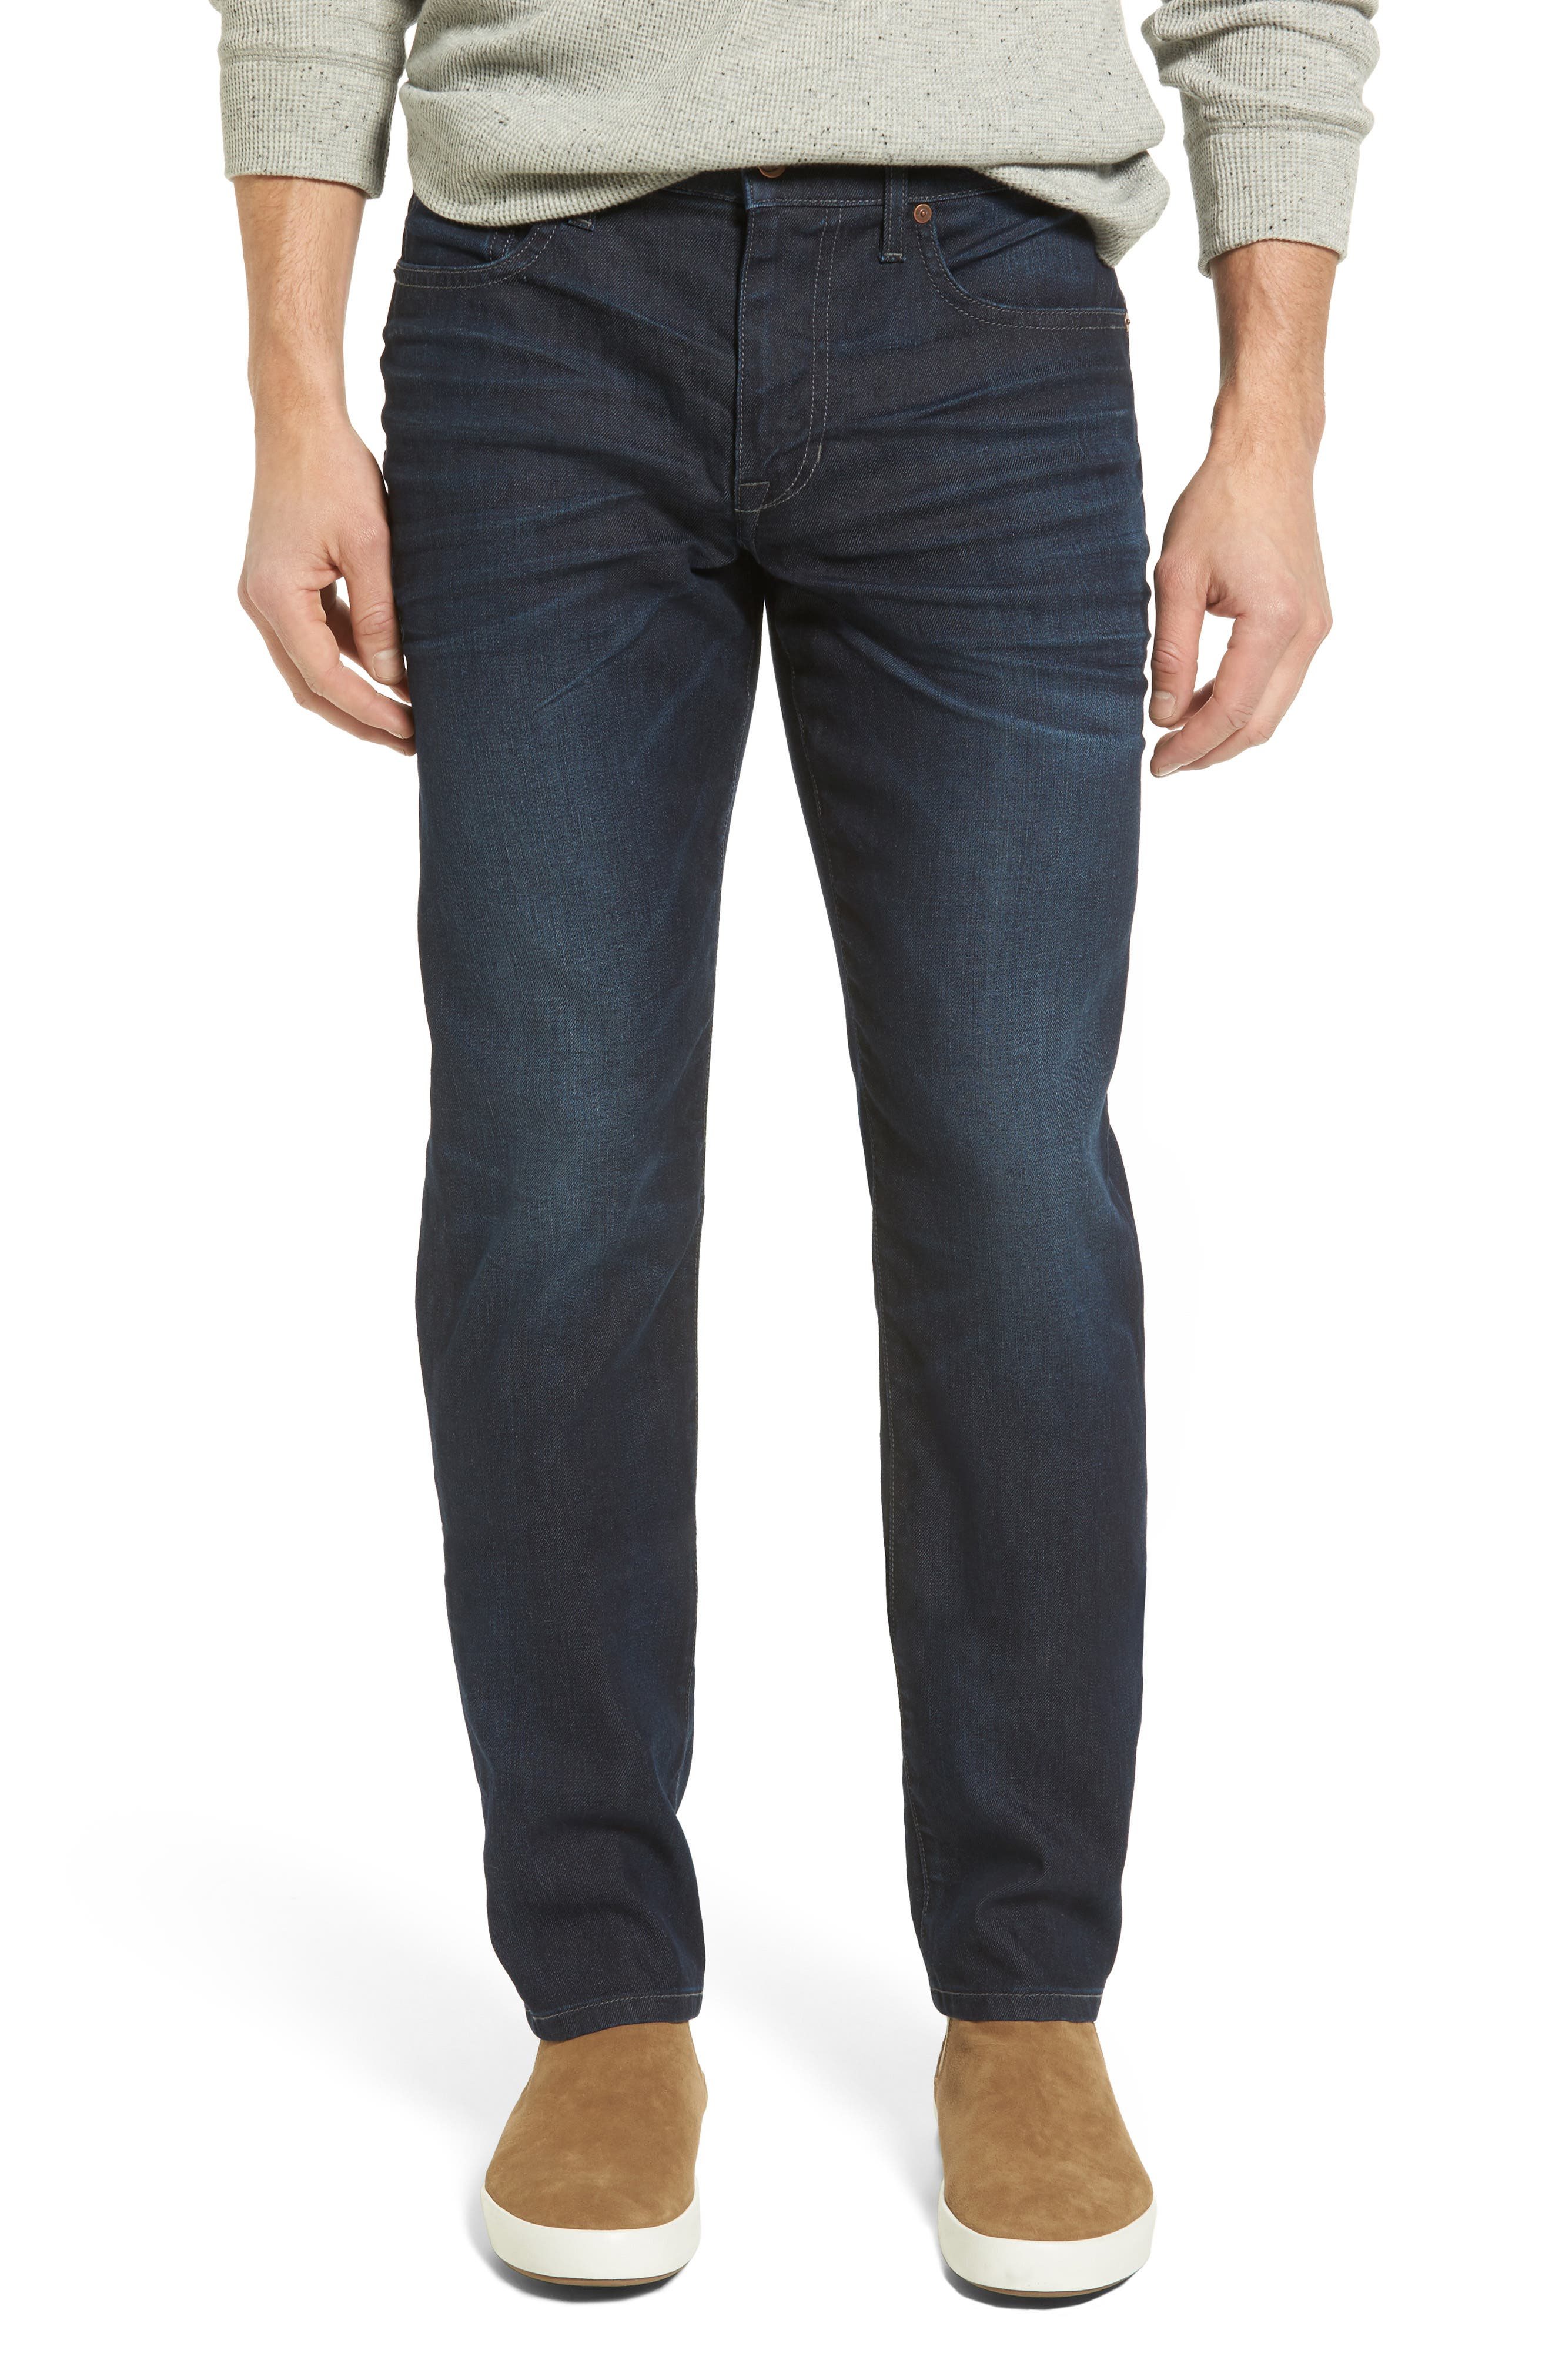 Brixton Slim Straight Leg Jeans,                         Main,                         color, 430